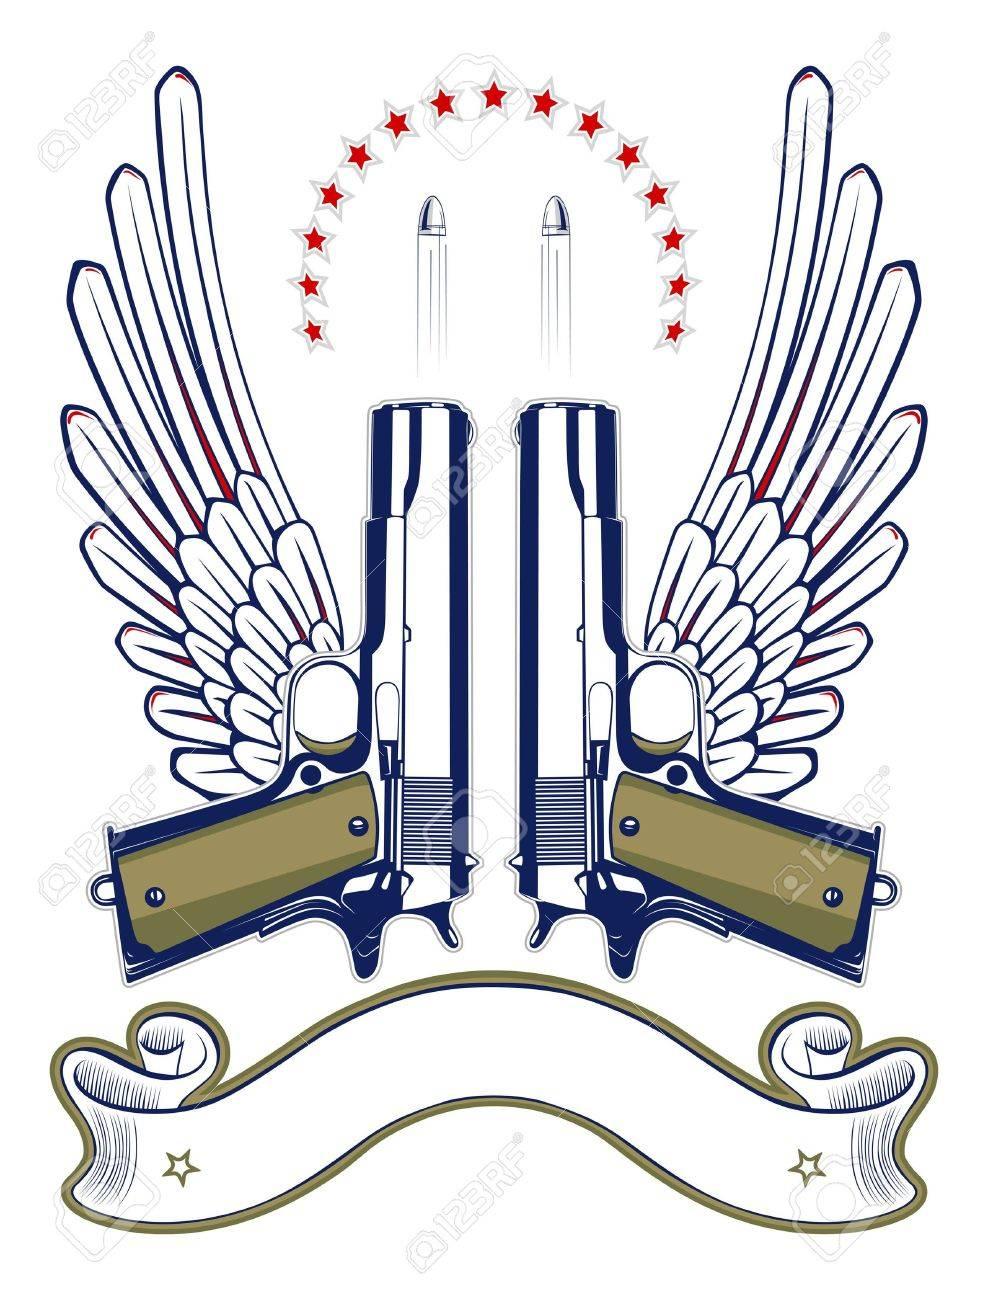 gun and bullet emblem with wings and ribbon - 10039219